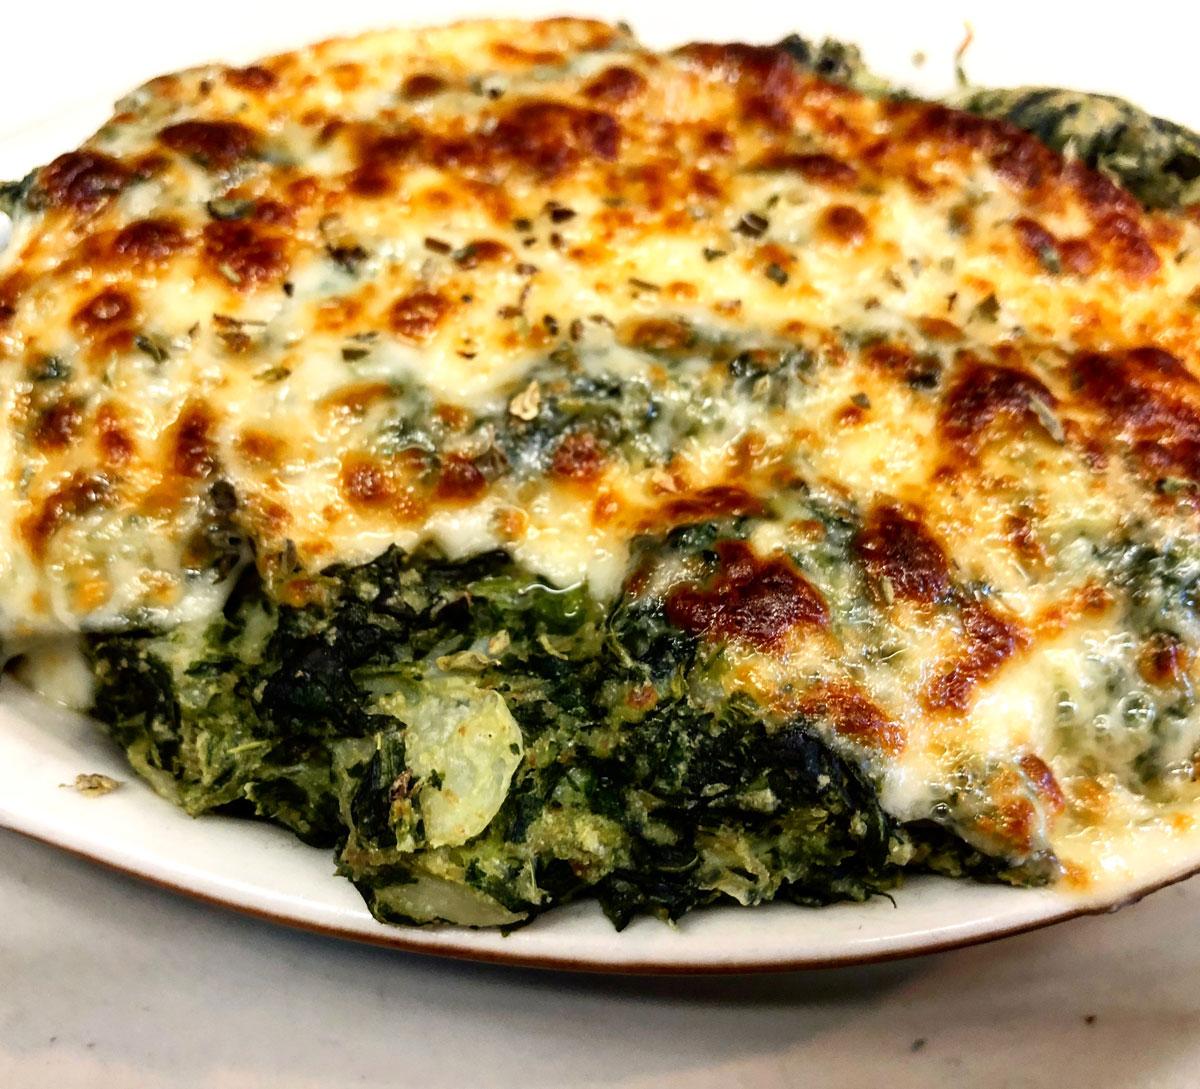 Hot Spinach & Feta Casserole